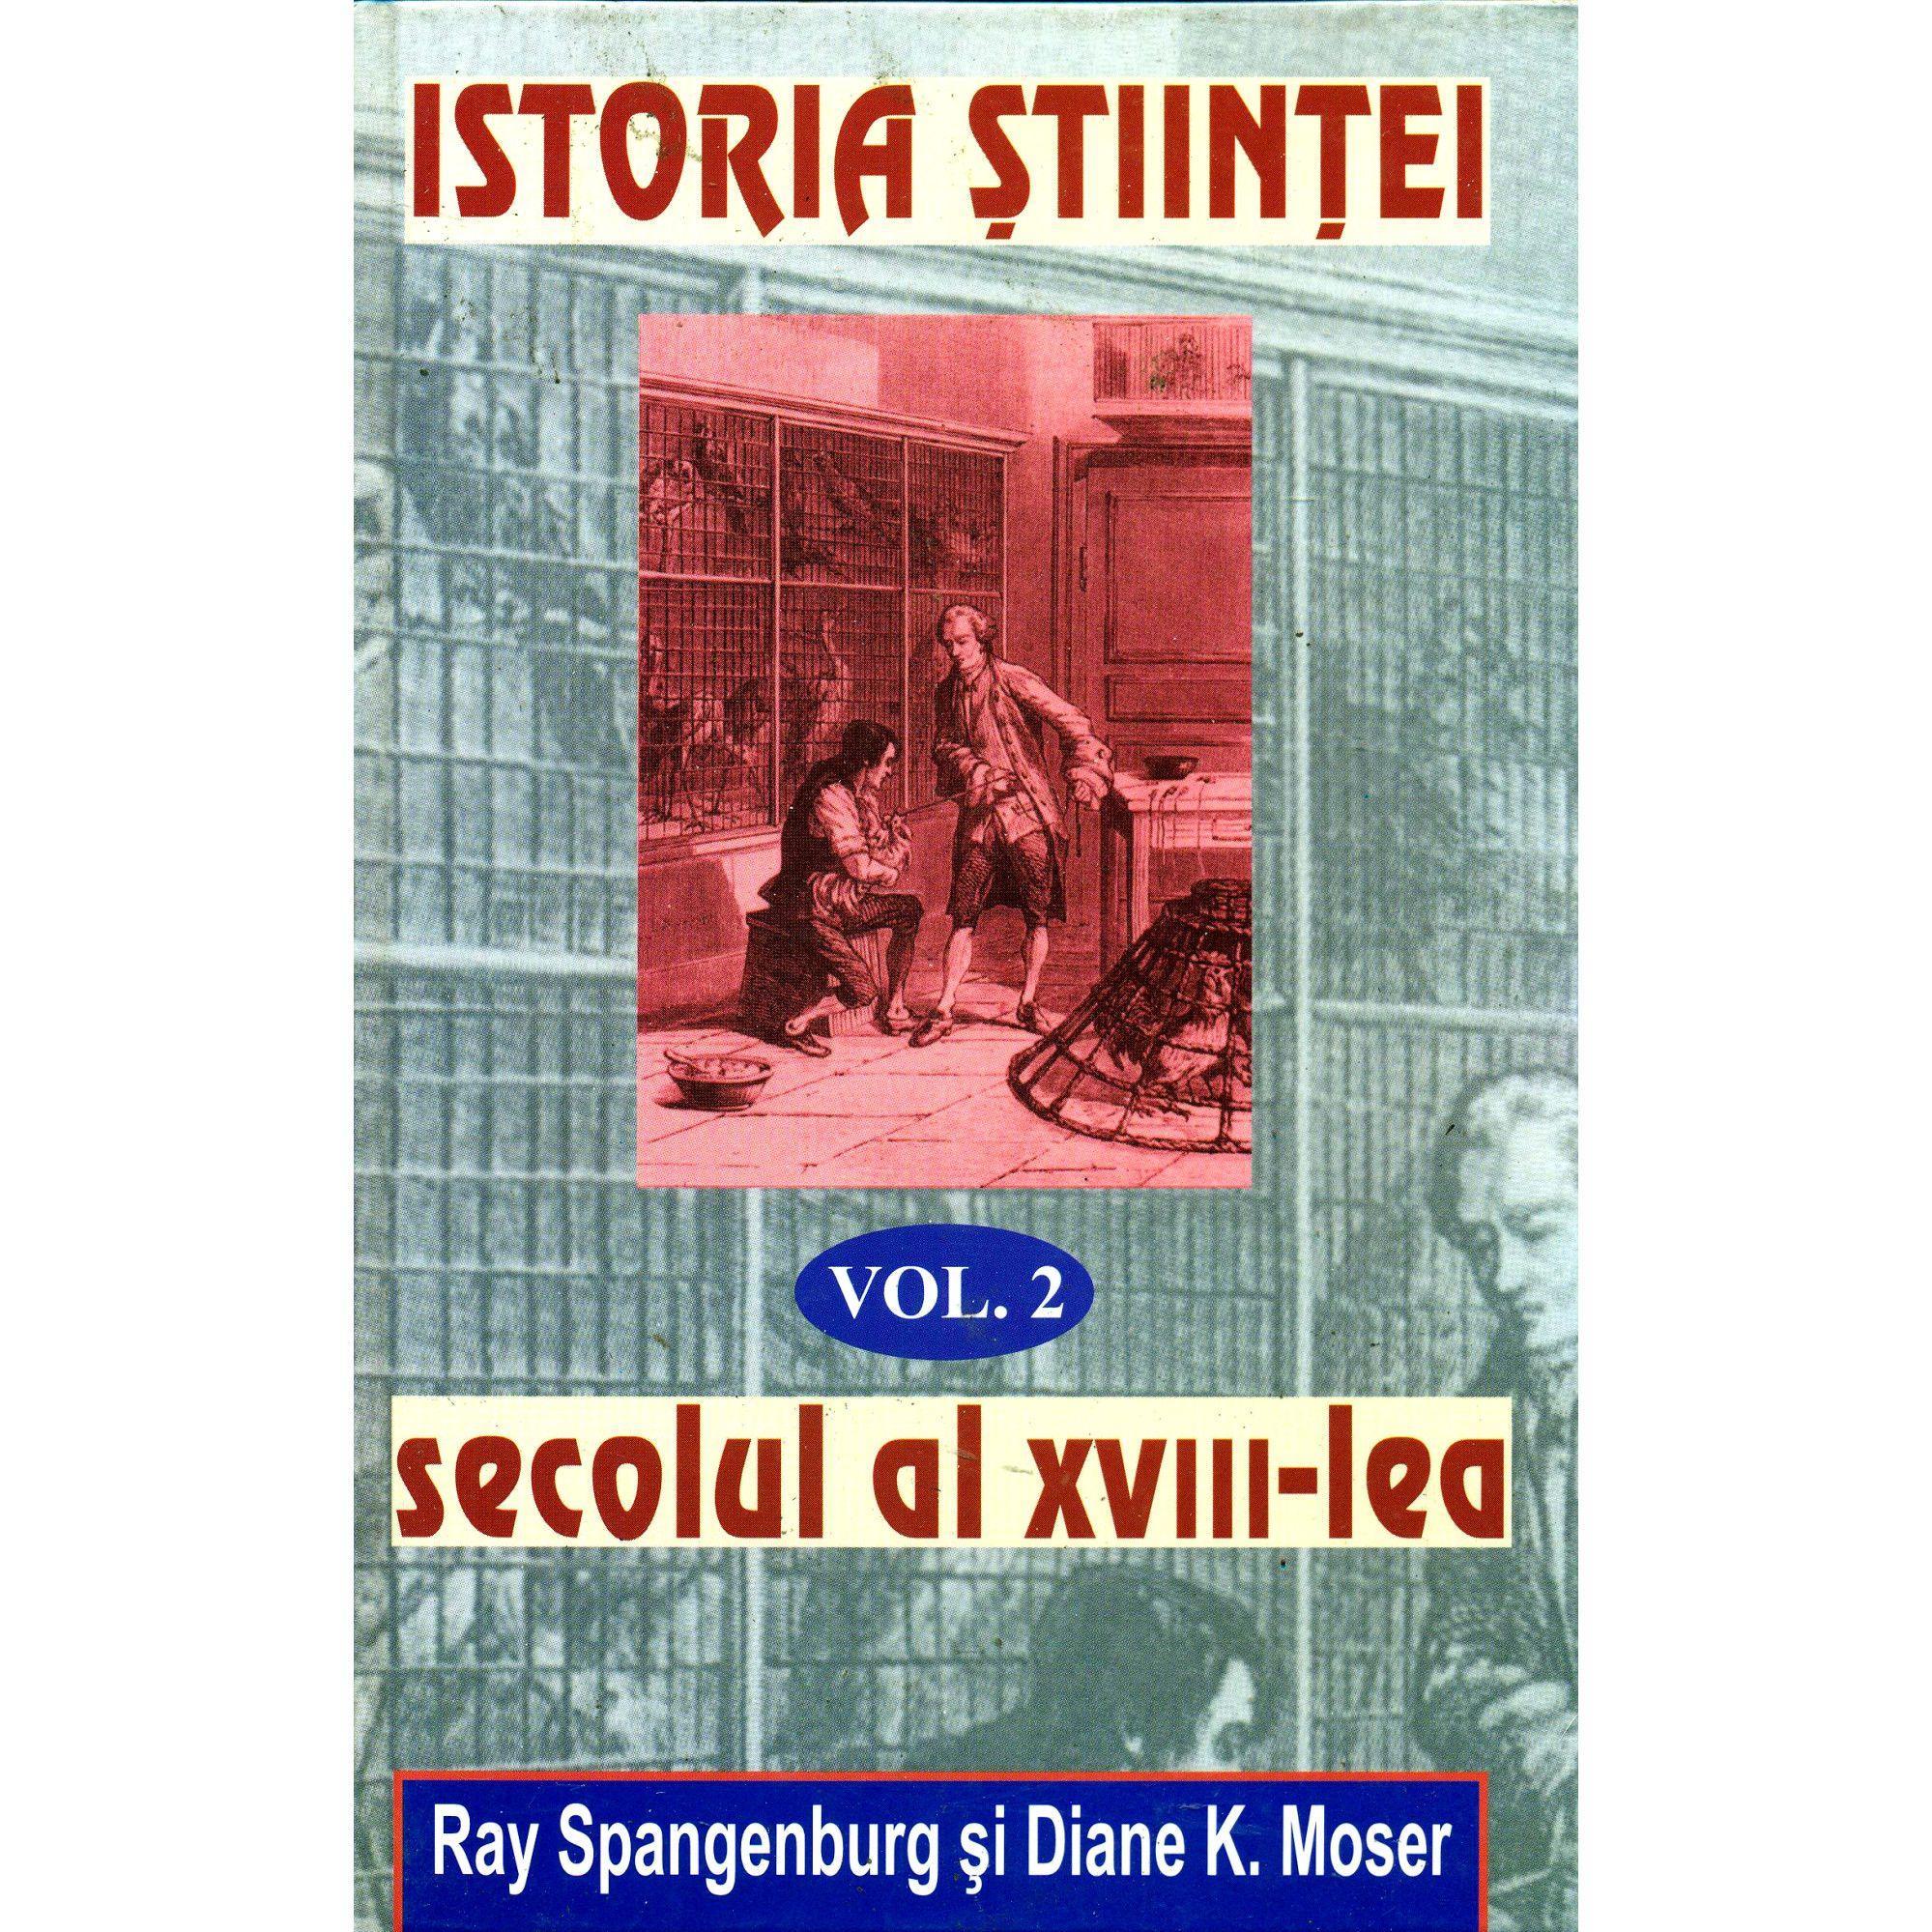 Istoria stiintei vol. 2|Secolul al XVIII-lea